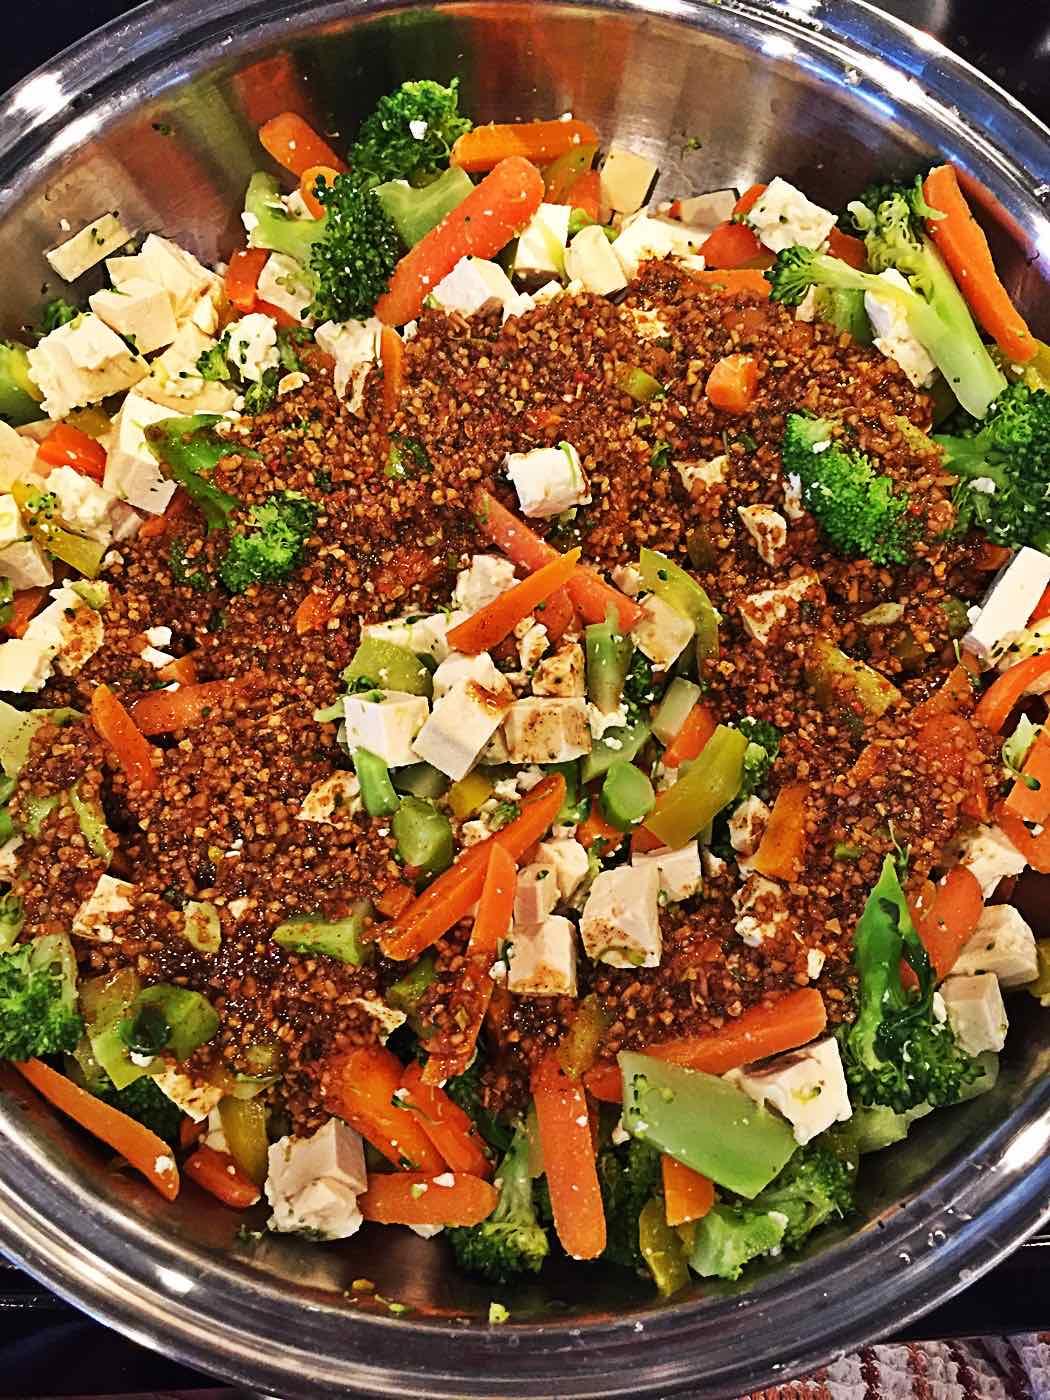 Vegan Tofu Pad Thai with Epicure seasoning sauce in wok, no oil